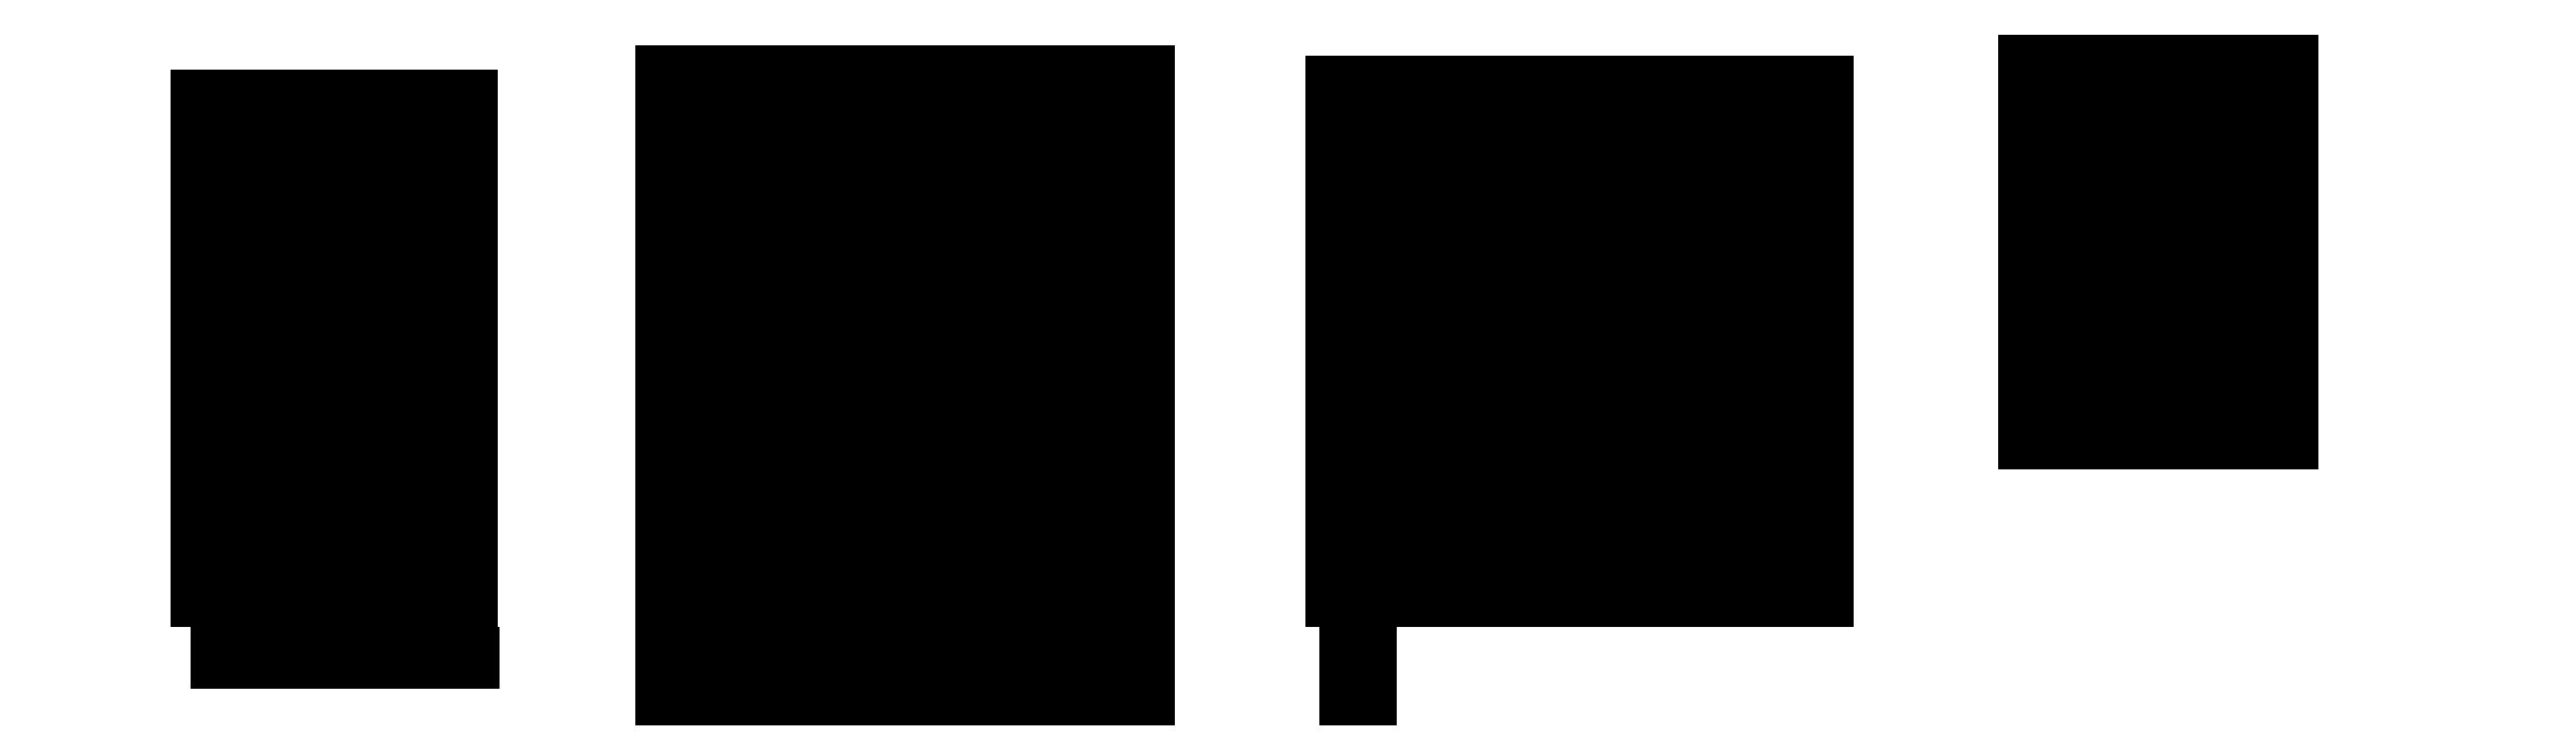 Typeface-Heimat-Mono-F14-Atlas-Font-Foundry